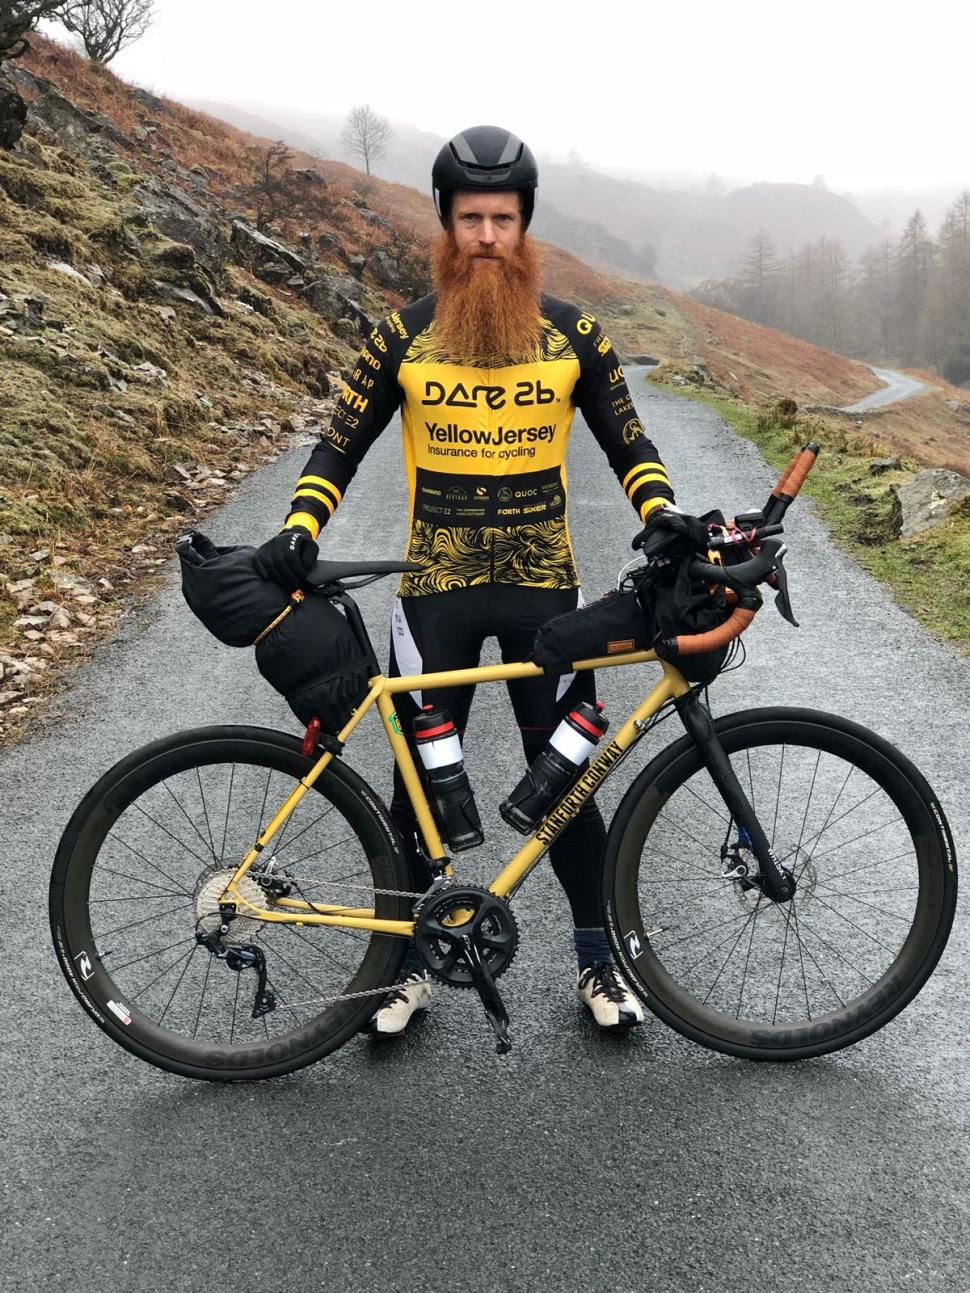 stanforth_cycles.jpg